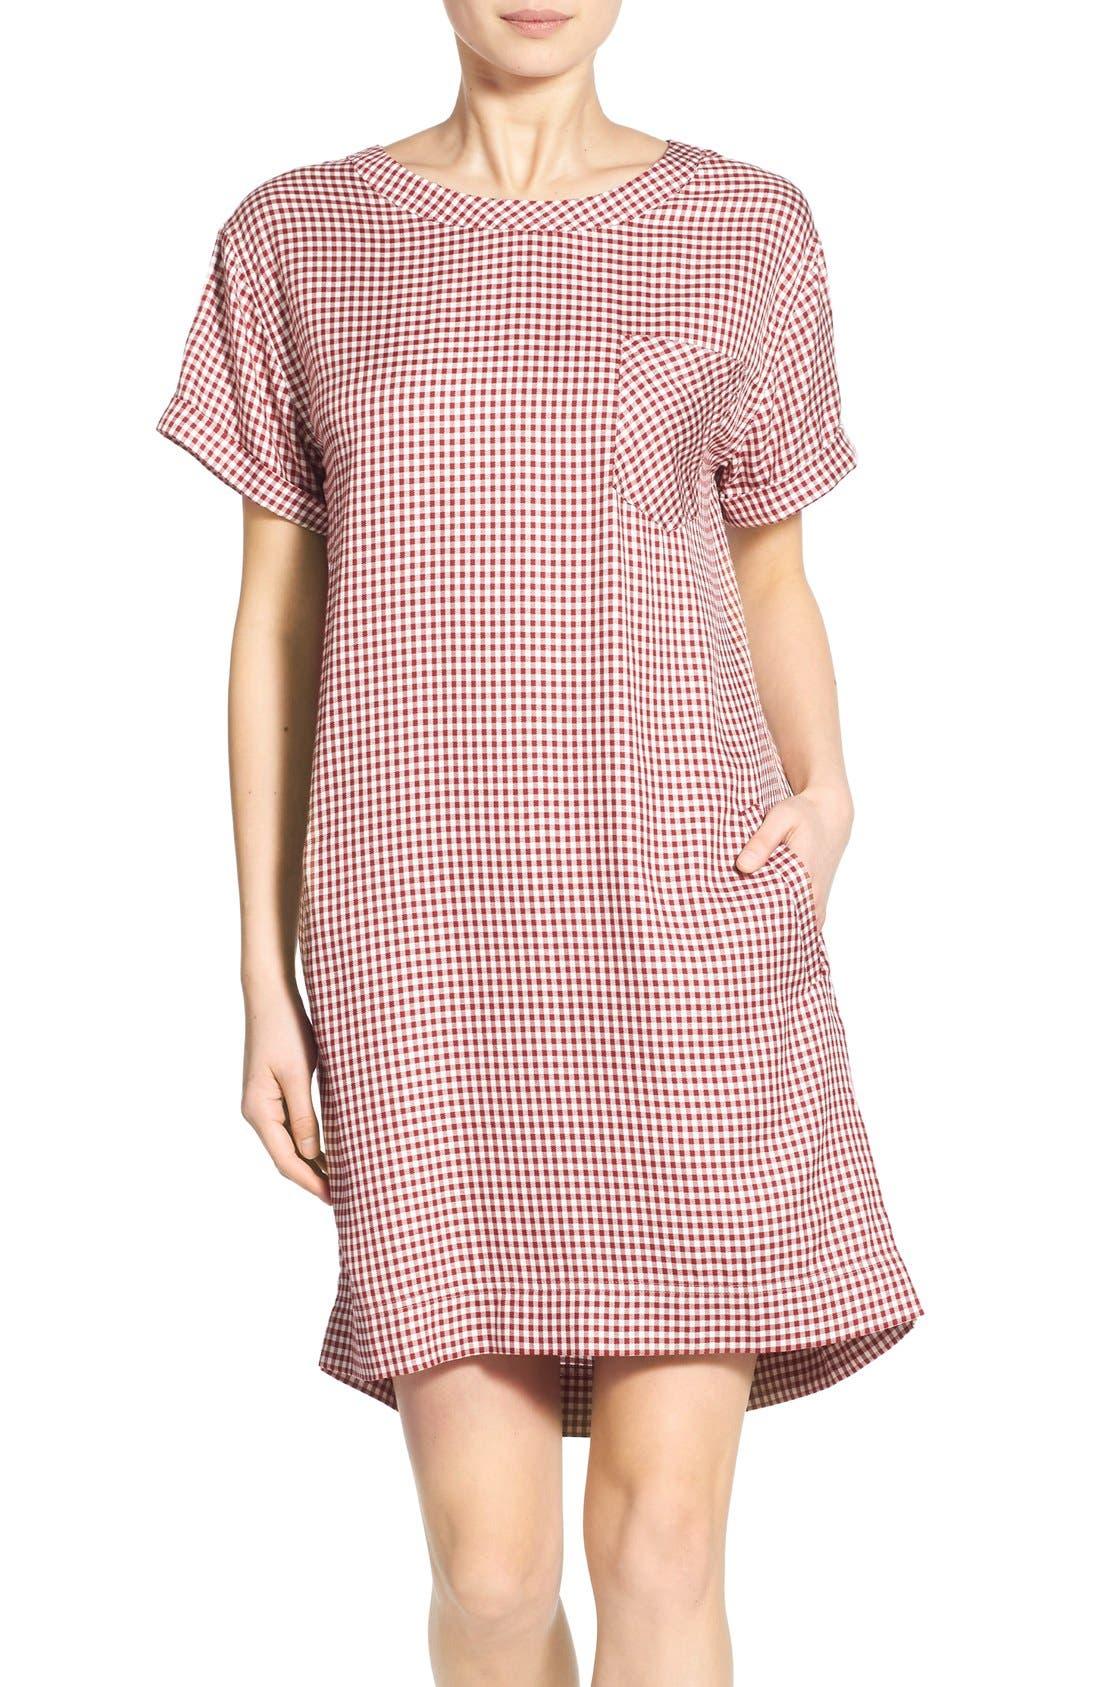 Main Image - Madewell 'Filmscore' Gingham Check Shirt-Sleeve Dress